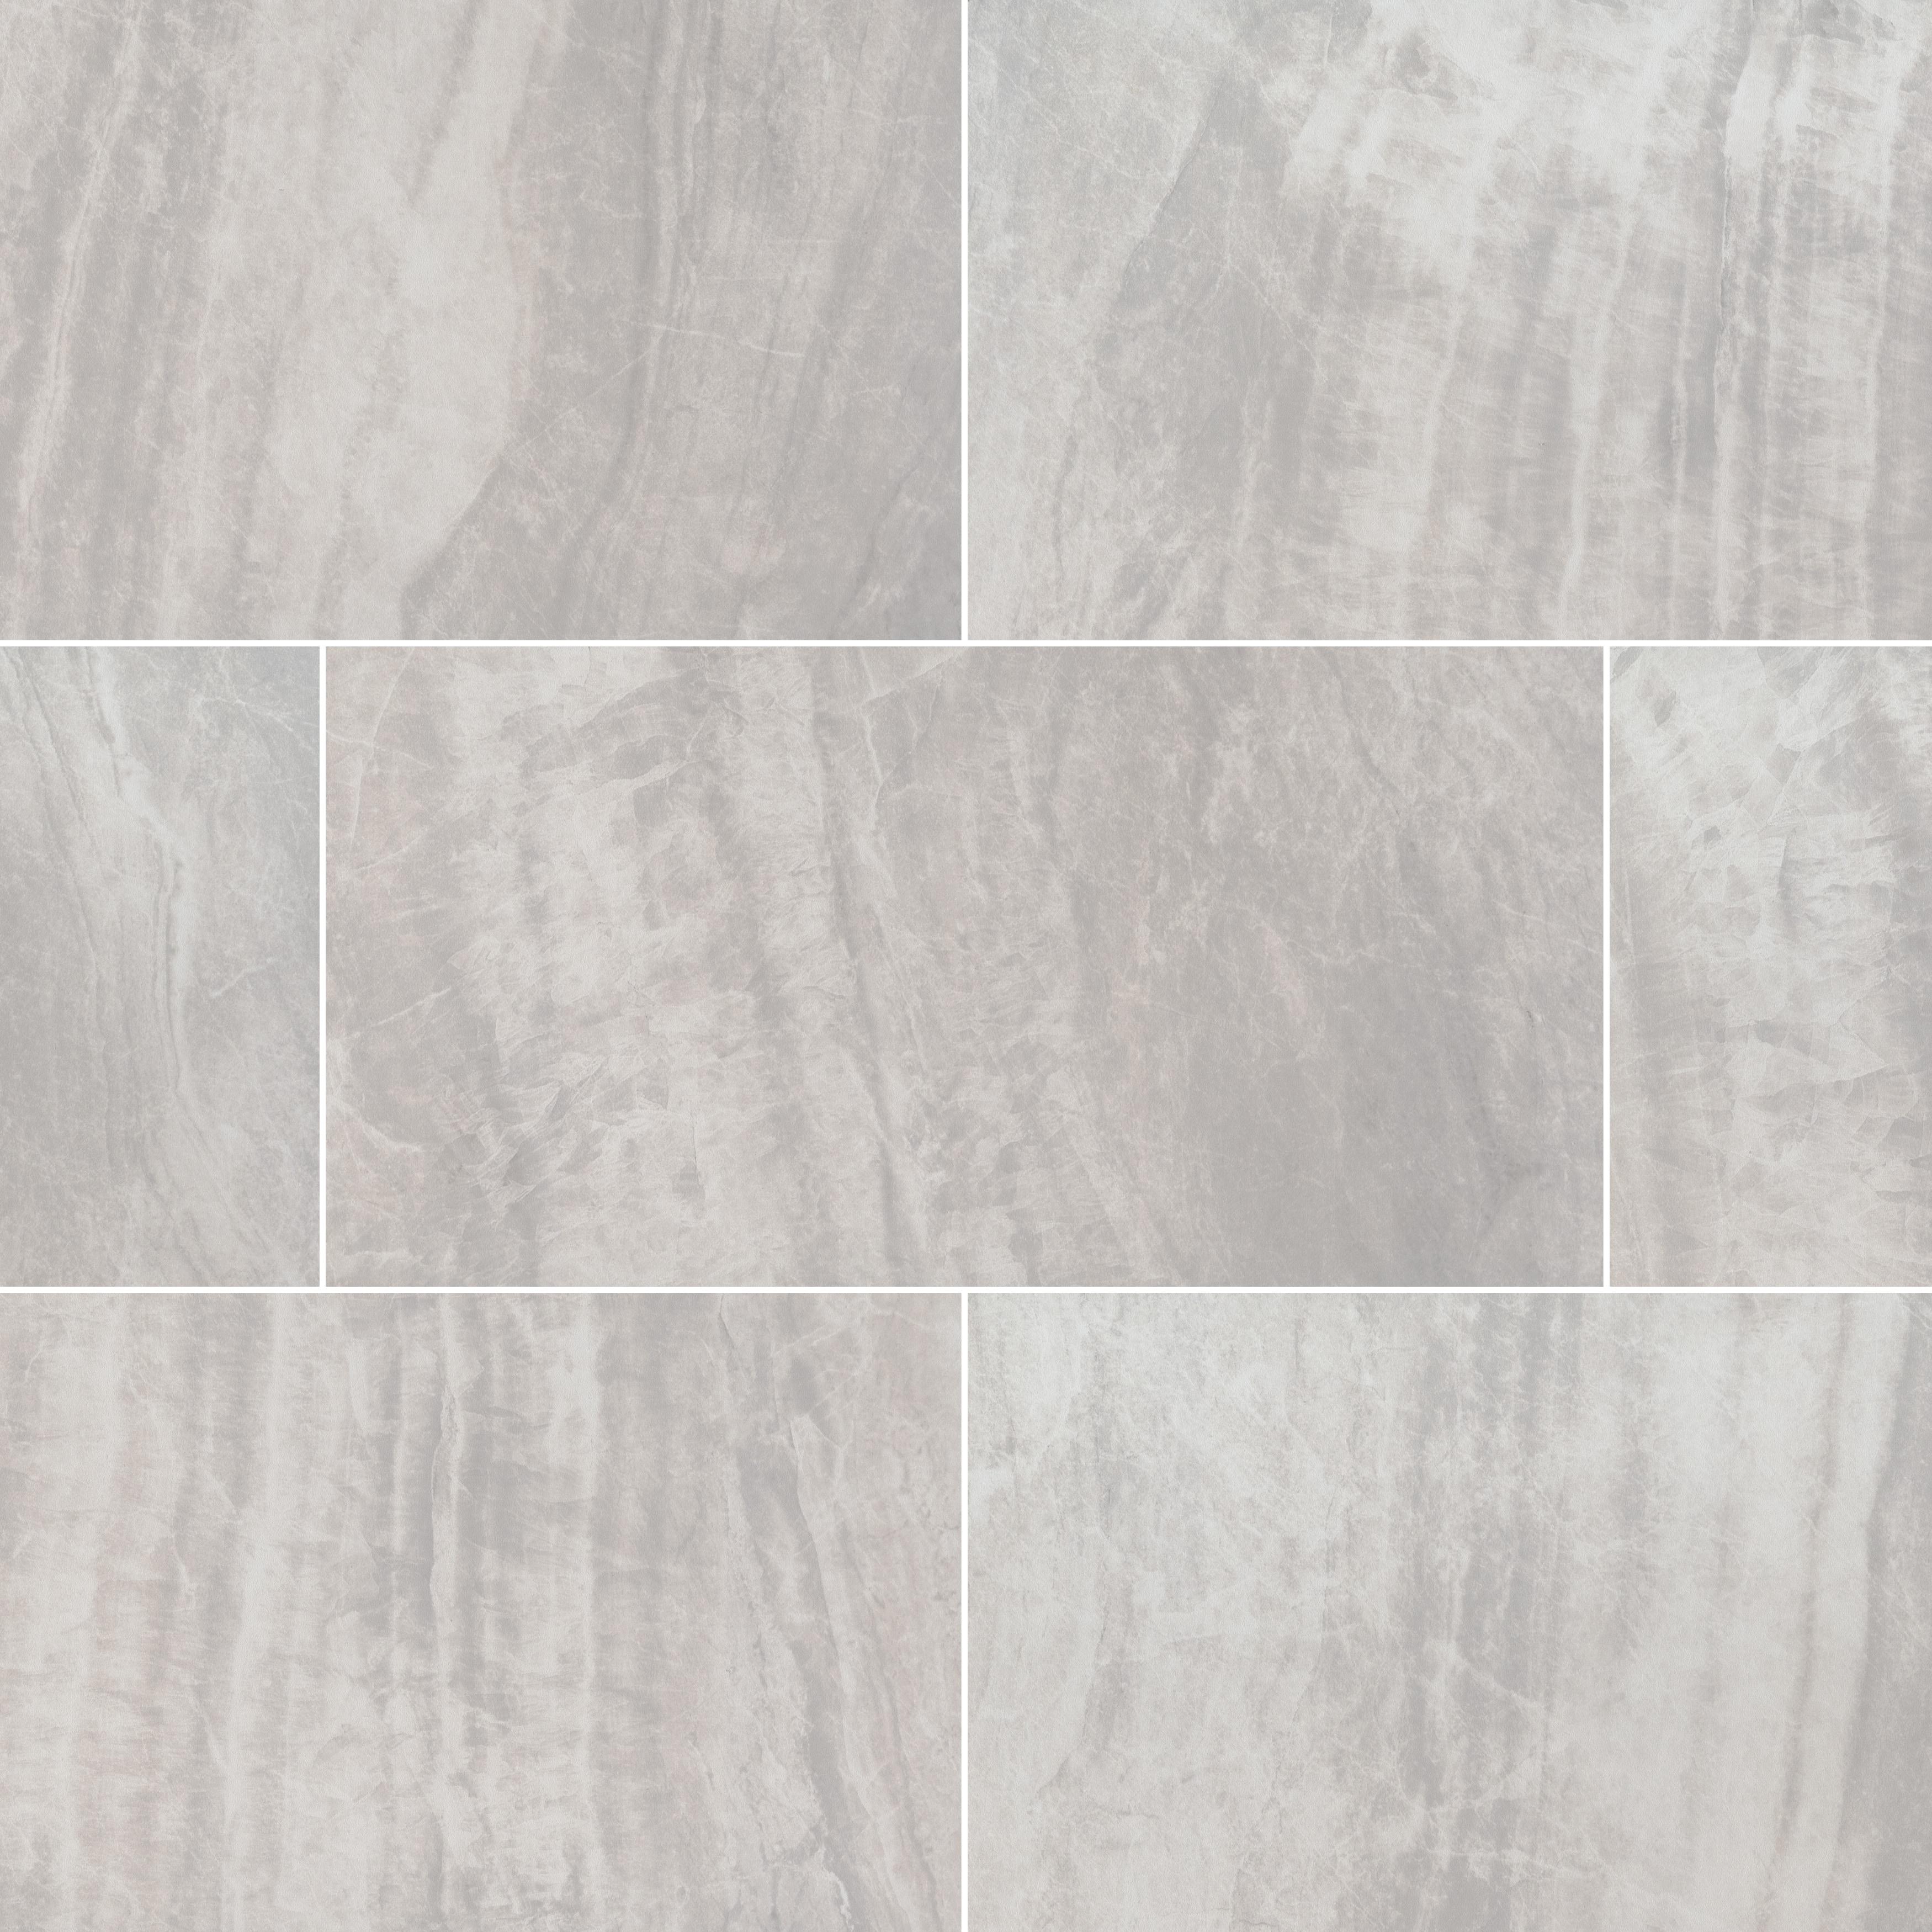 "Girigio / 24""x24""x2cm / Matte Porcelain Tile Pavers - Seaside Marble Series 0"